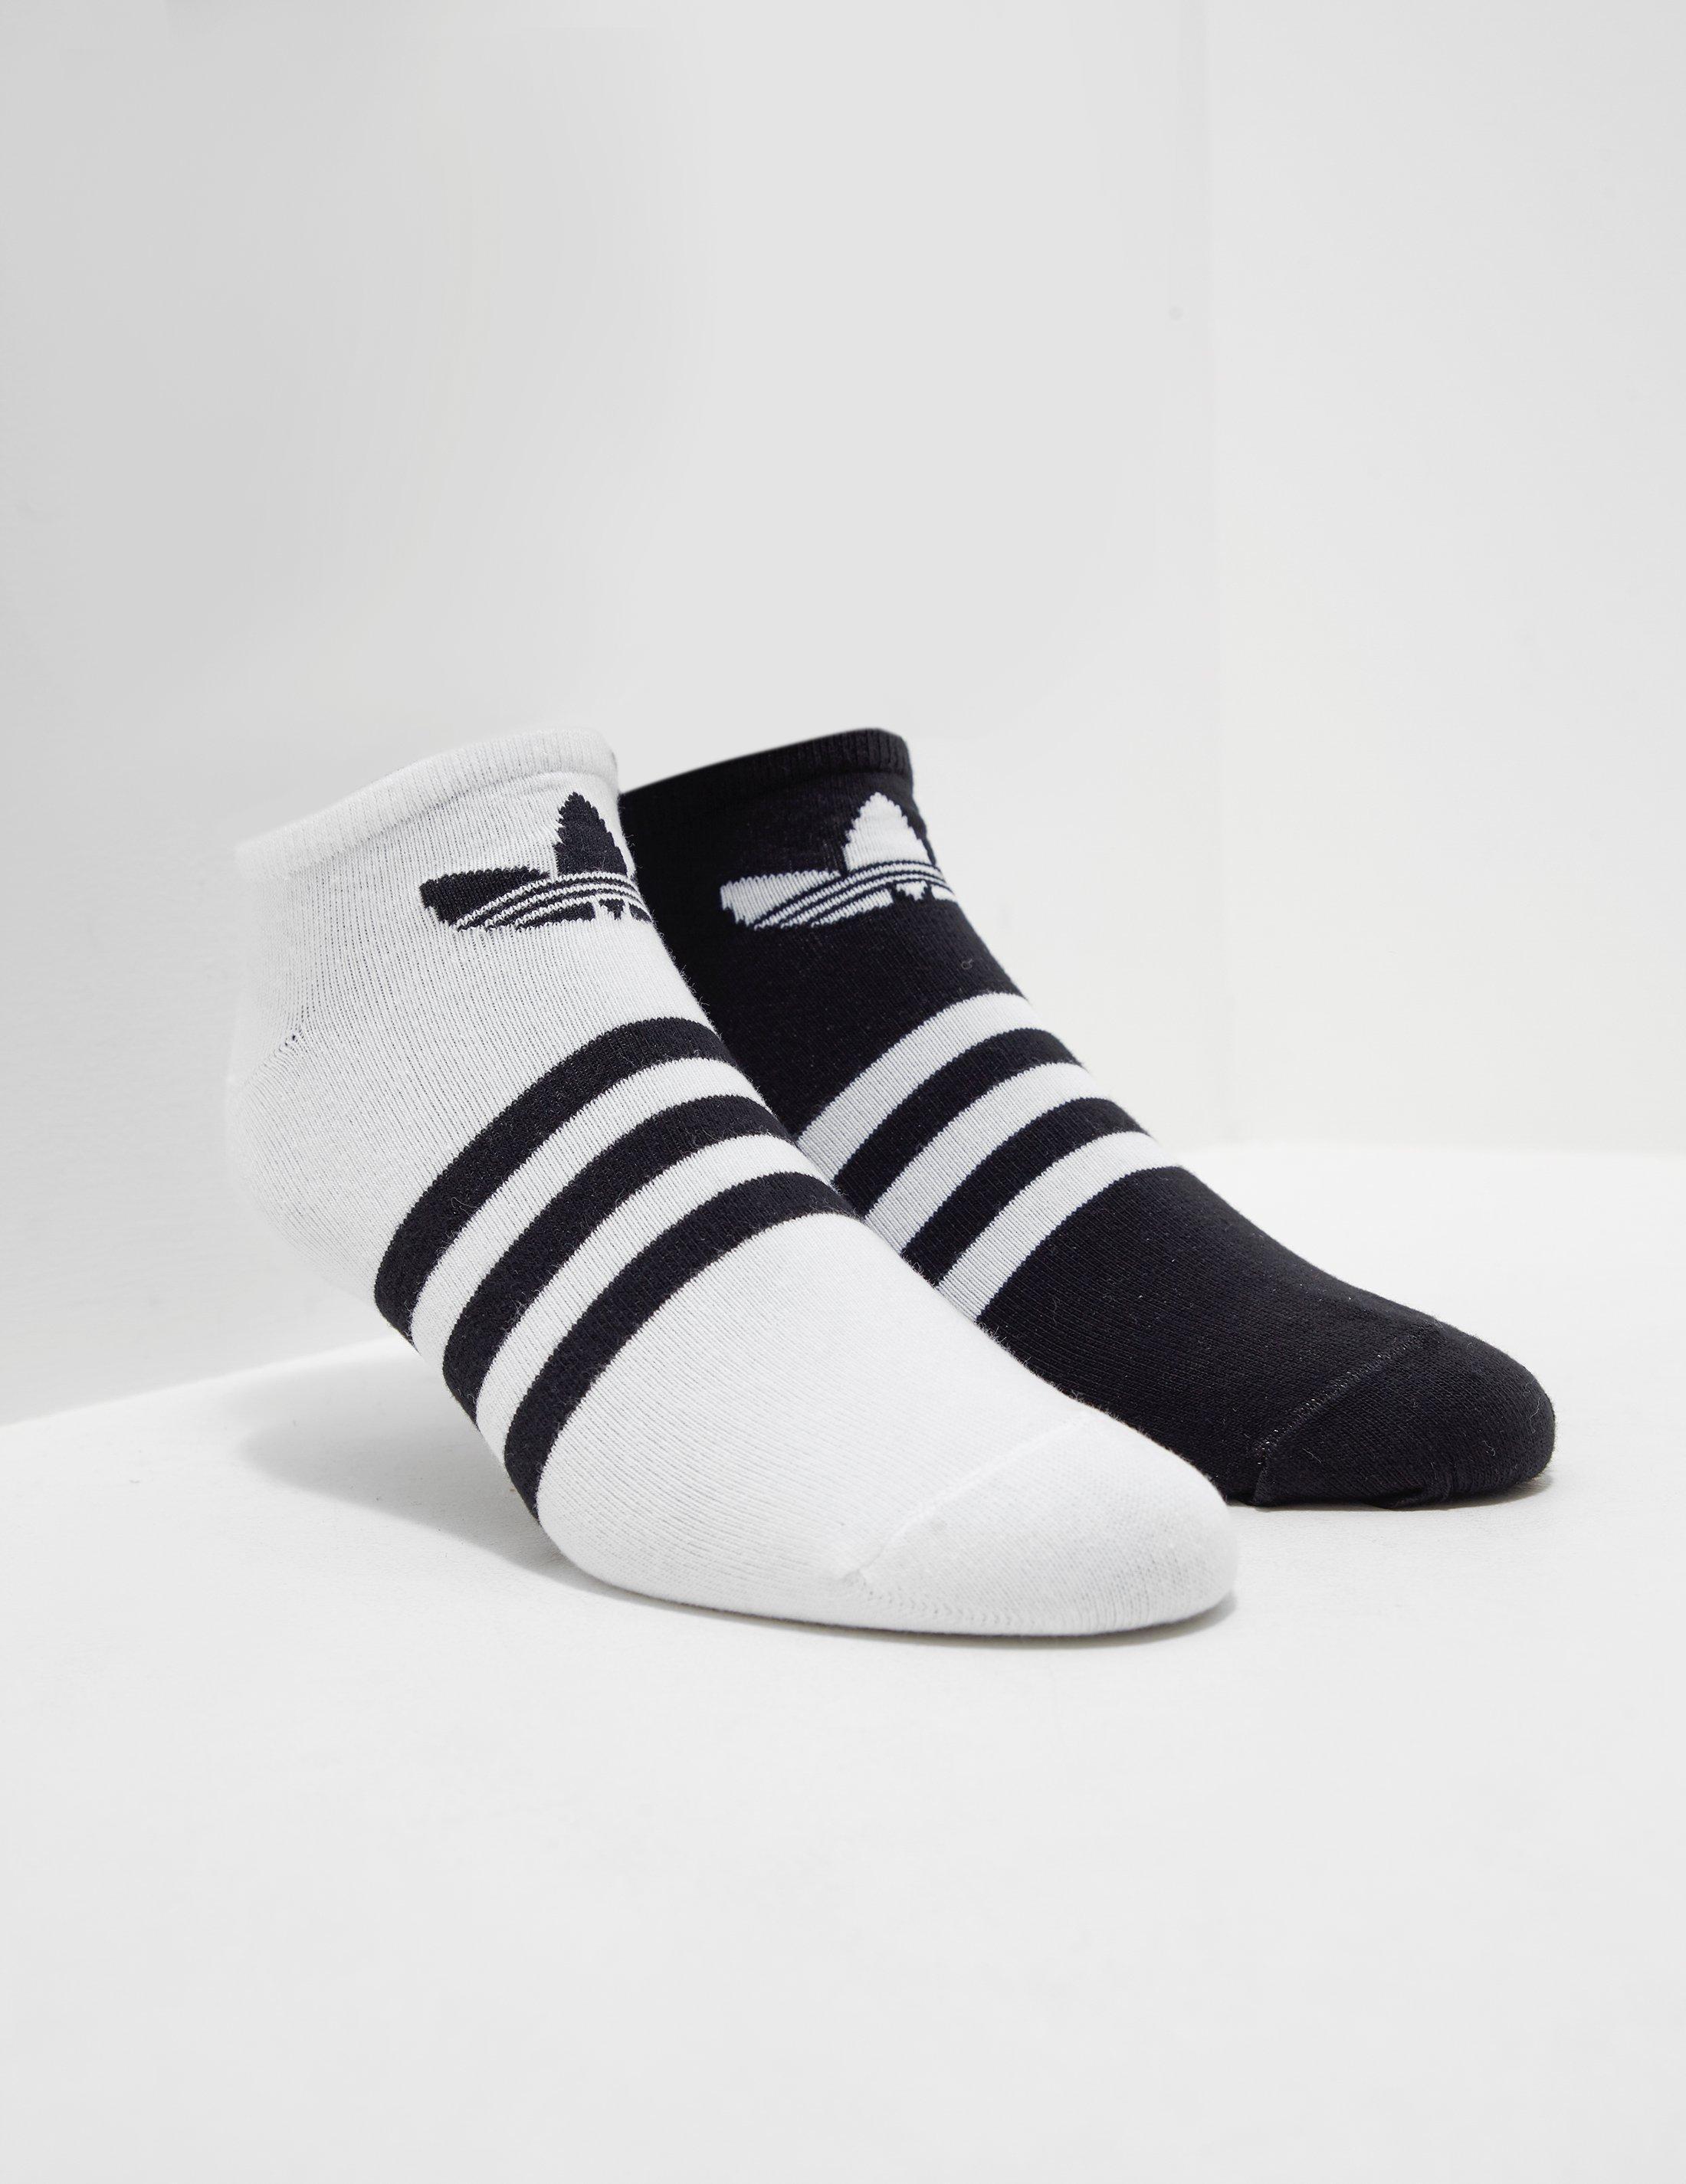 adidas mens trainer socks